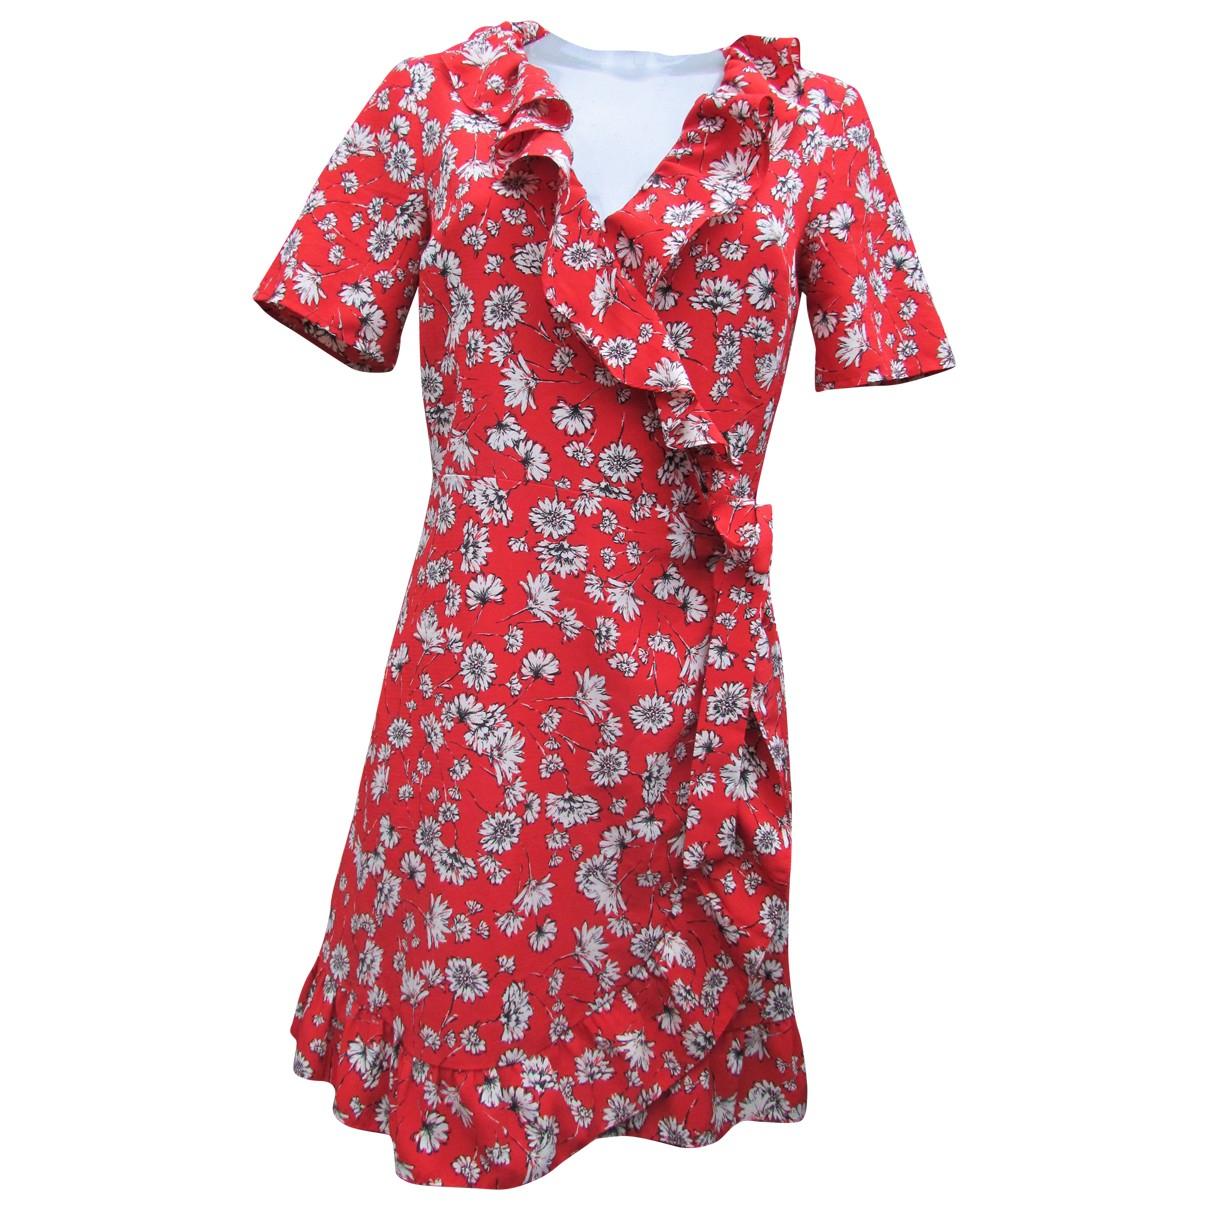 tophop \N Red dress for Women 40 FR